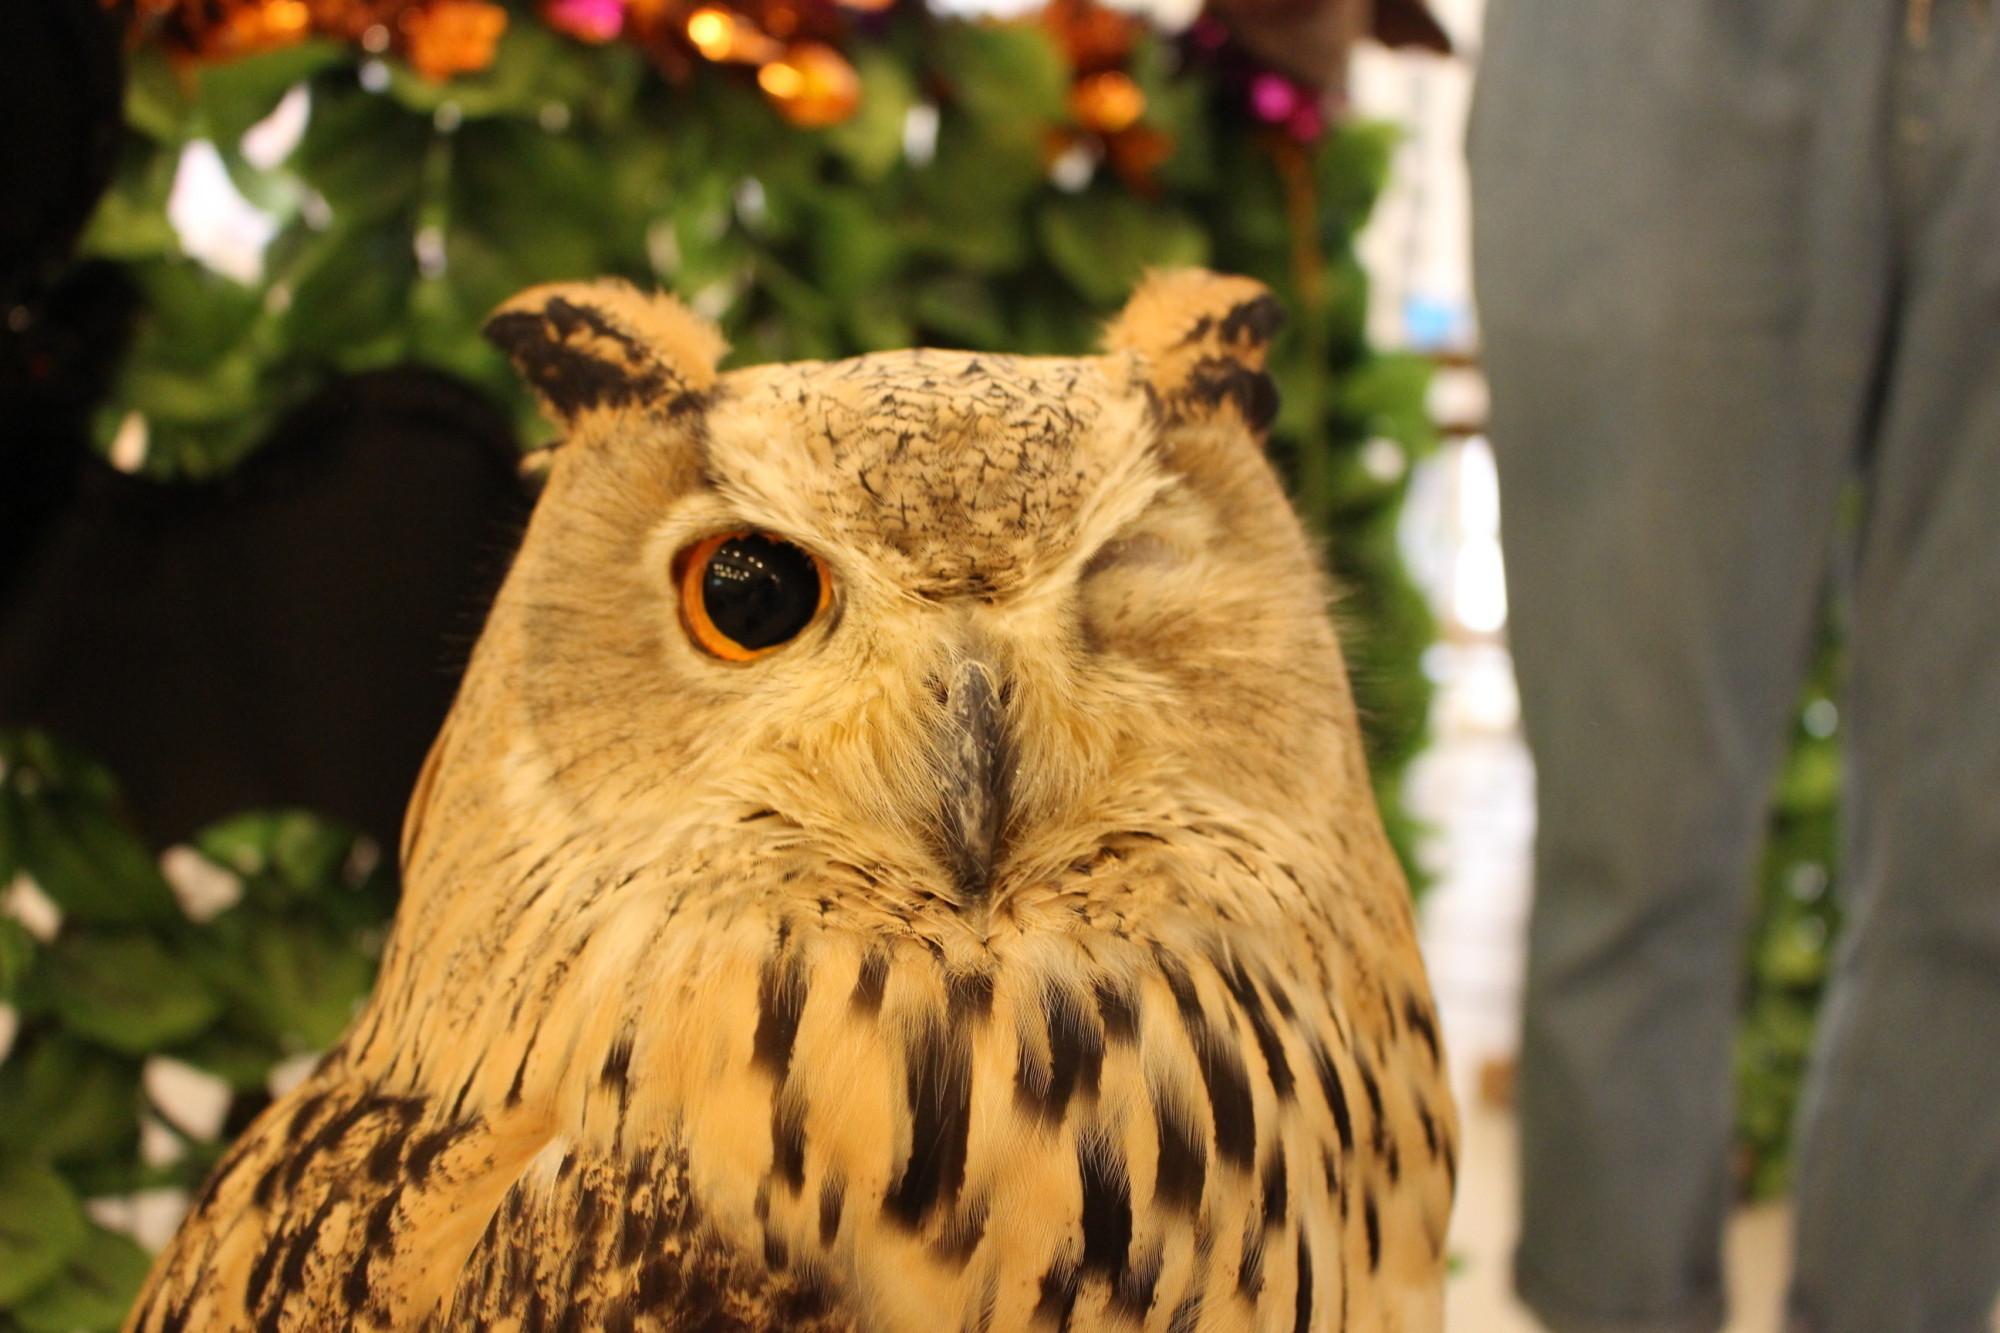 和蓬鬆可愛的貓頭鷹互動,為你帶來歡樂!大阪天滿宮『貓頭鷹的店(フクロウのみせ)大阪本店』